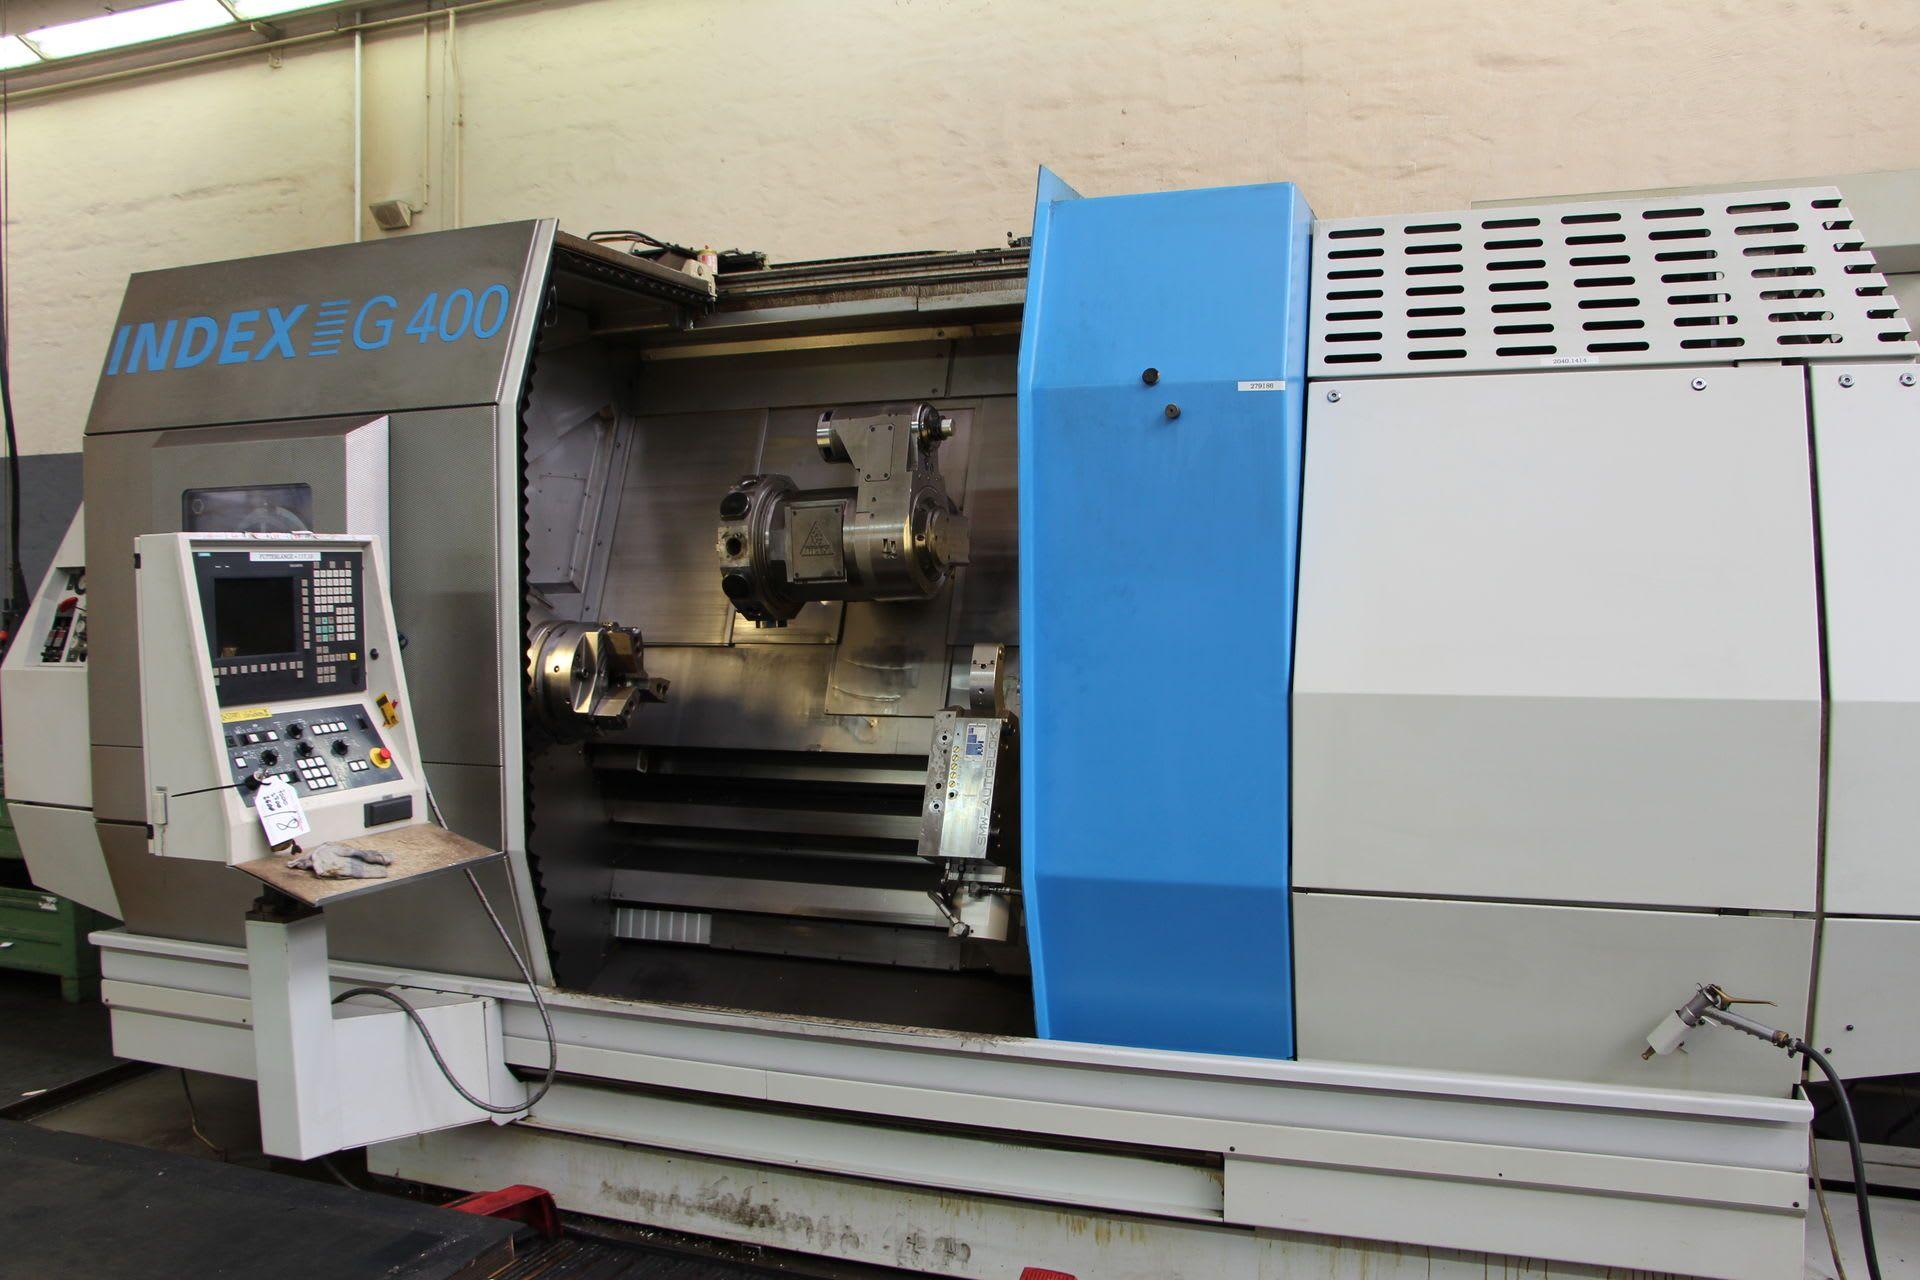 Drehmaschine CNC INDEX G 400